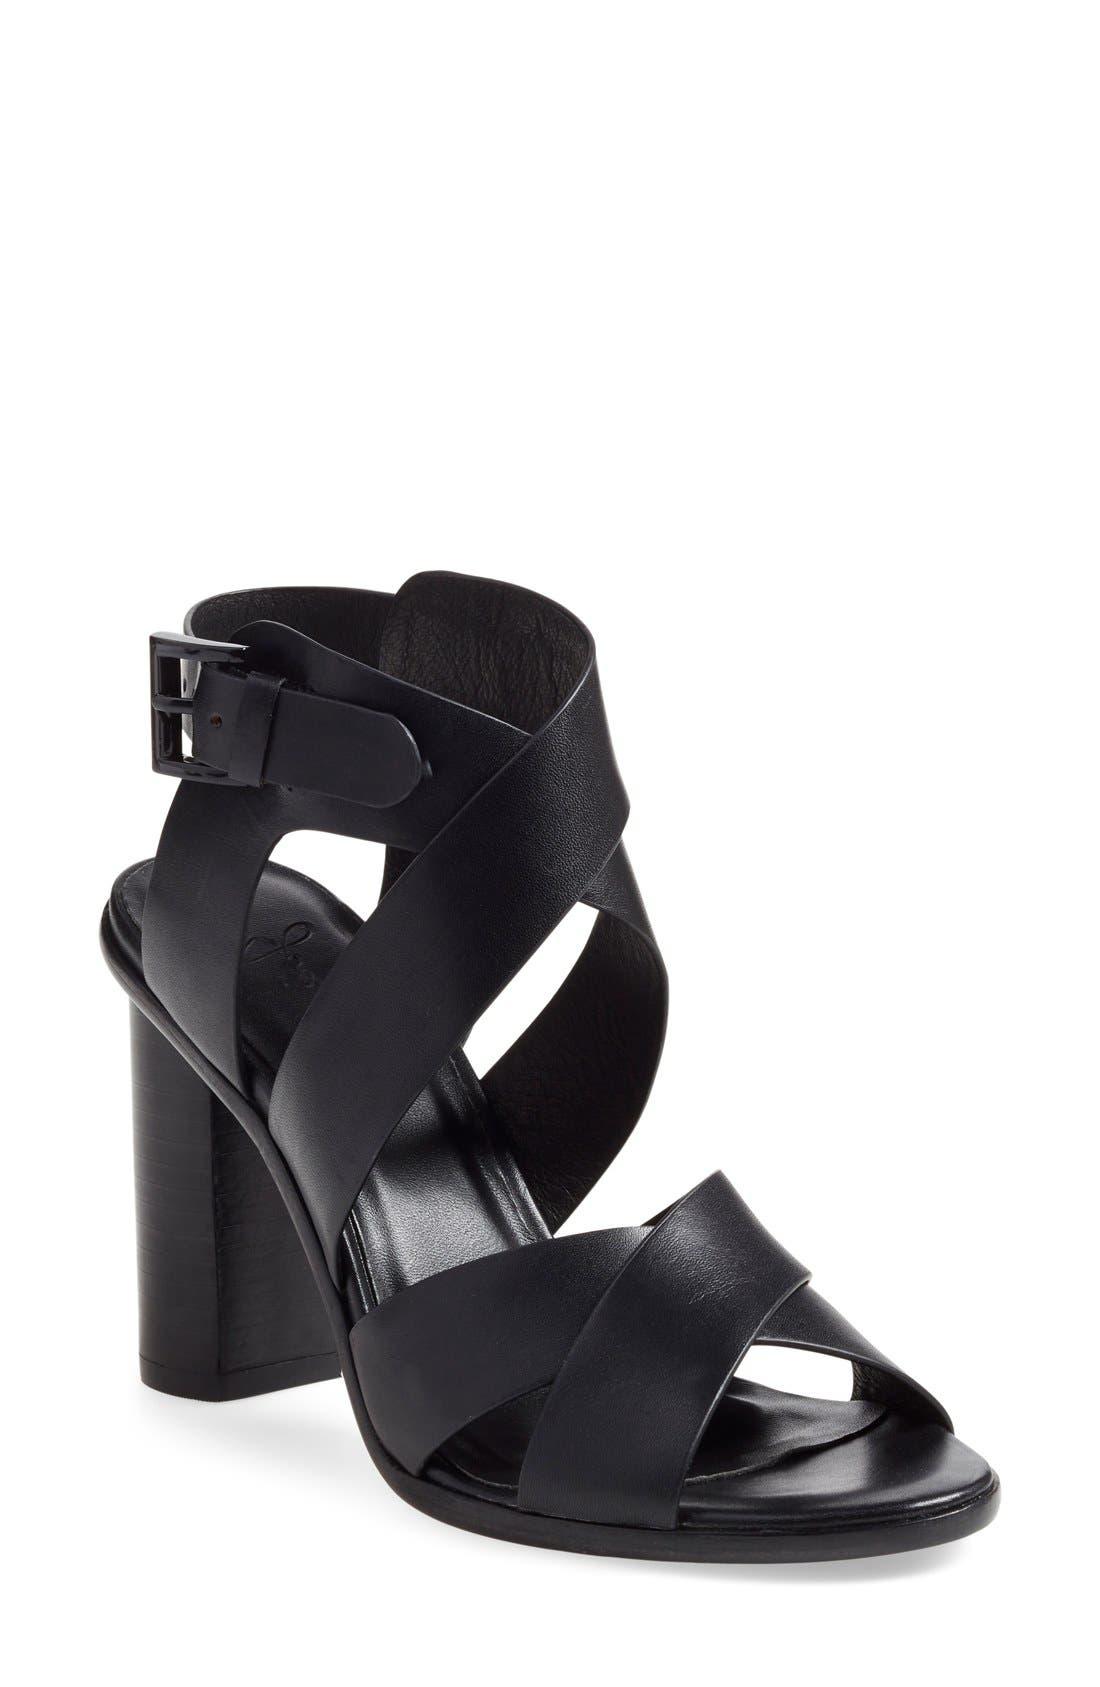 Main Image - Joie 'Avery' Crisscross Block Heel Sandal (Women)